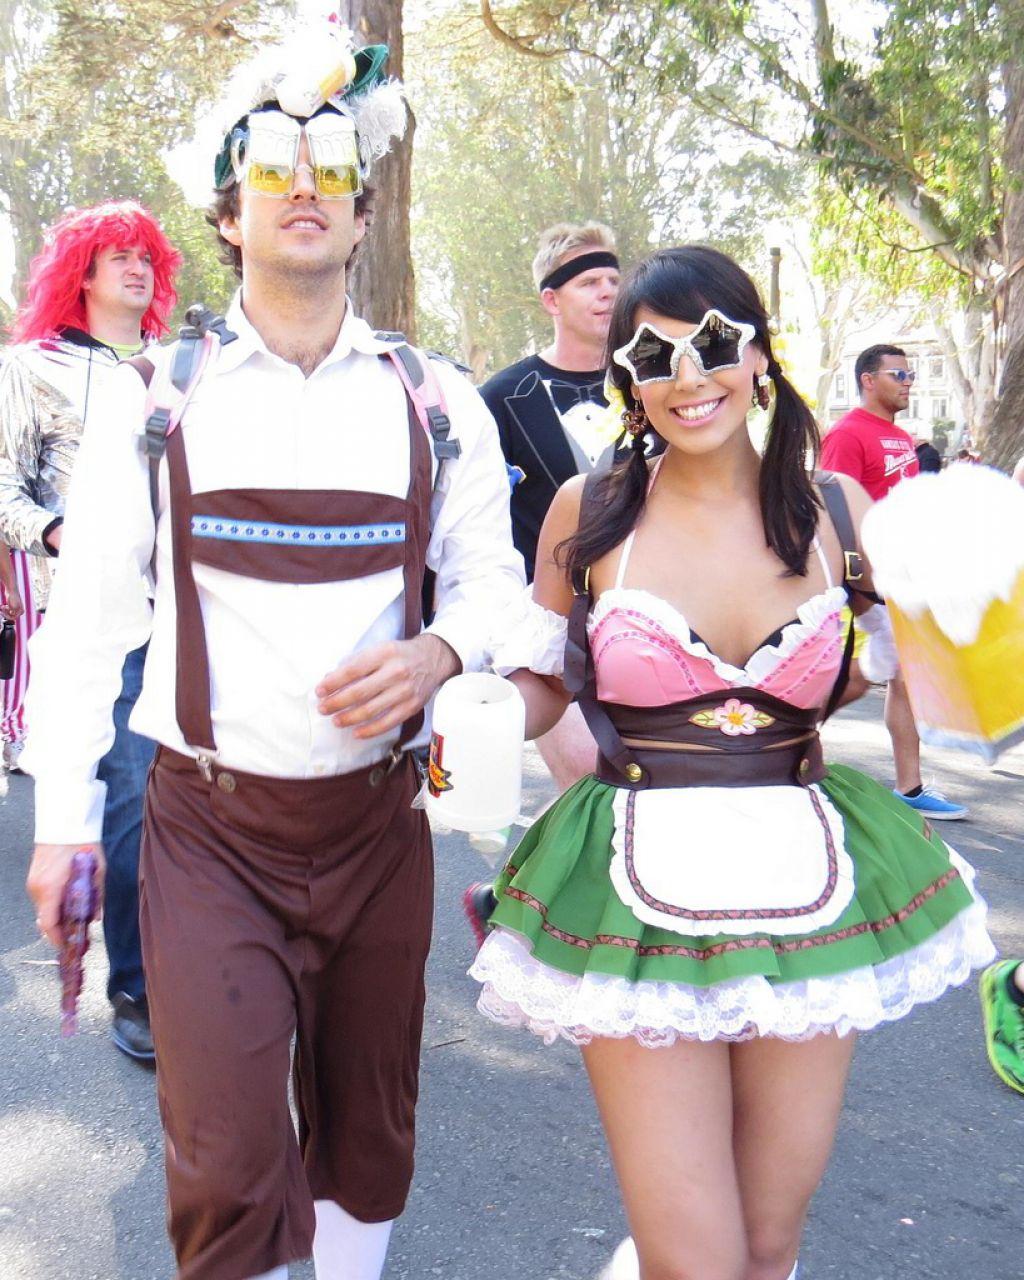 bay breakers17 Top Costumes at Bay to Breakers in San Francisco